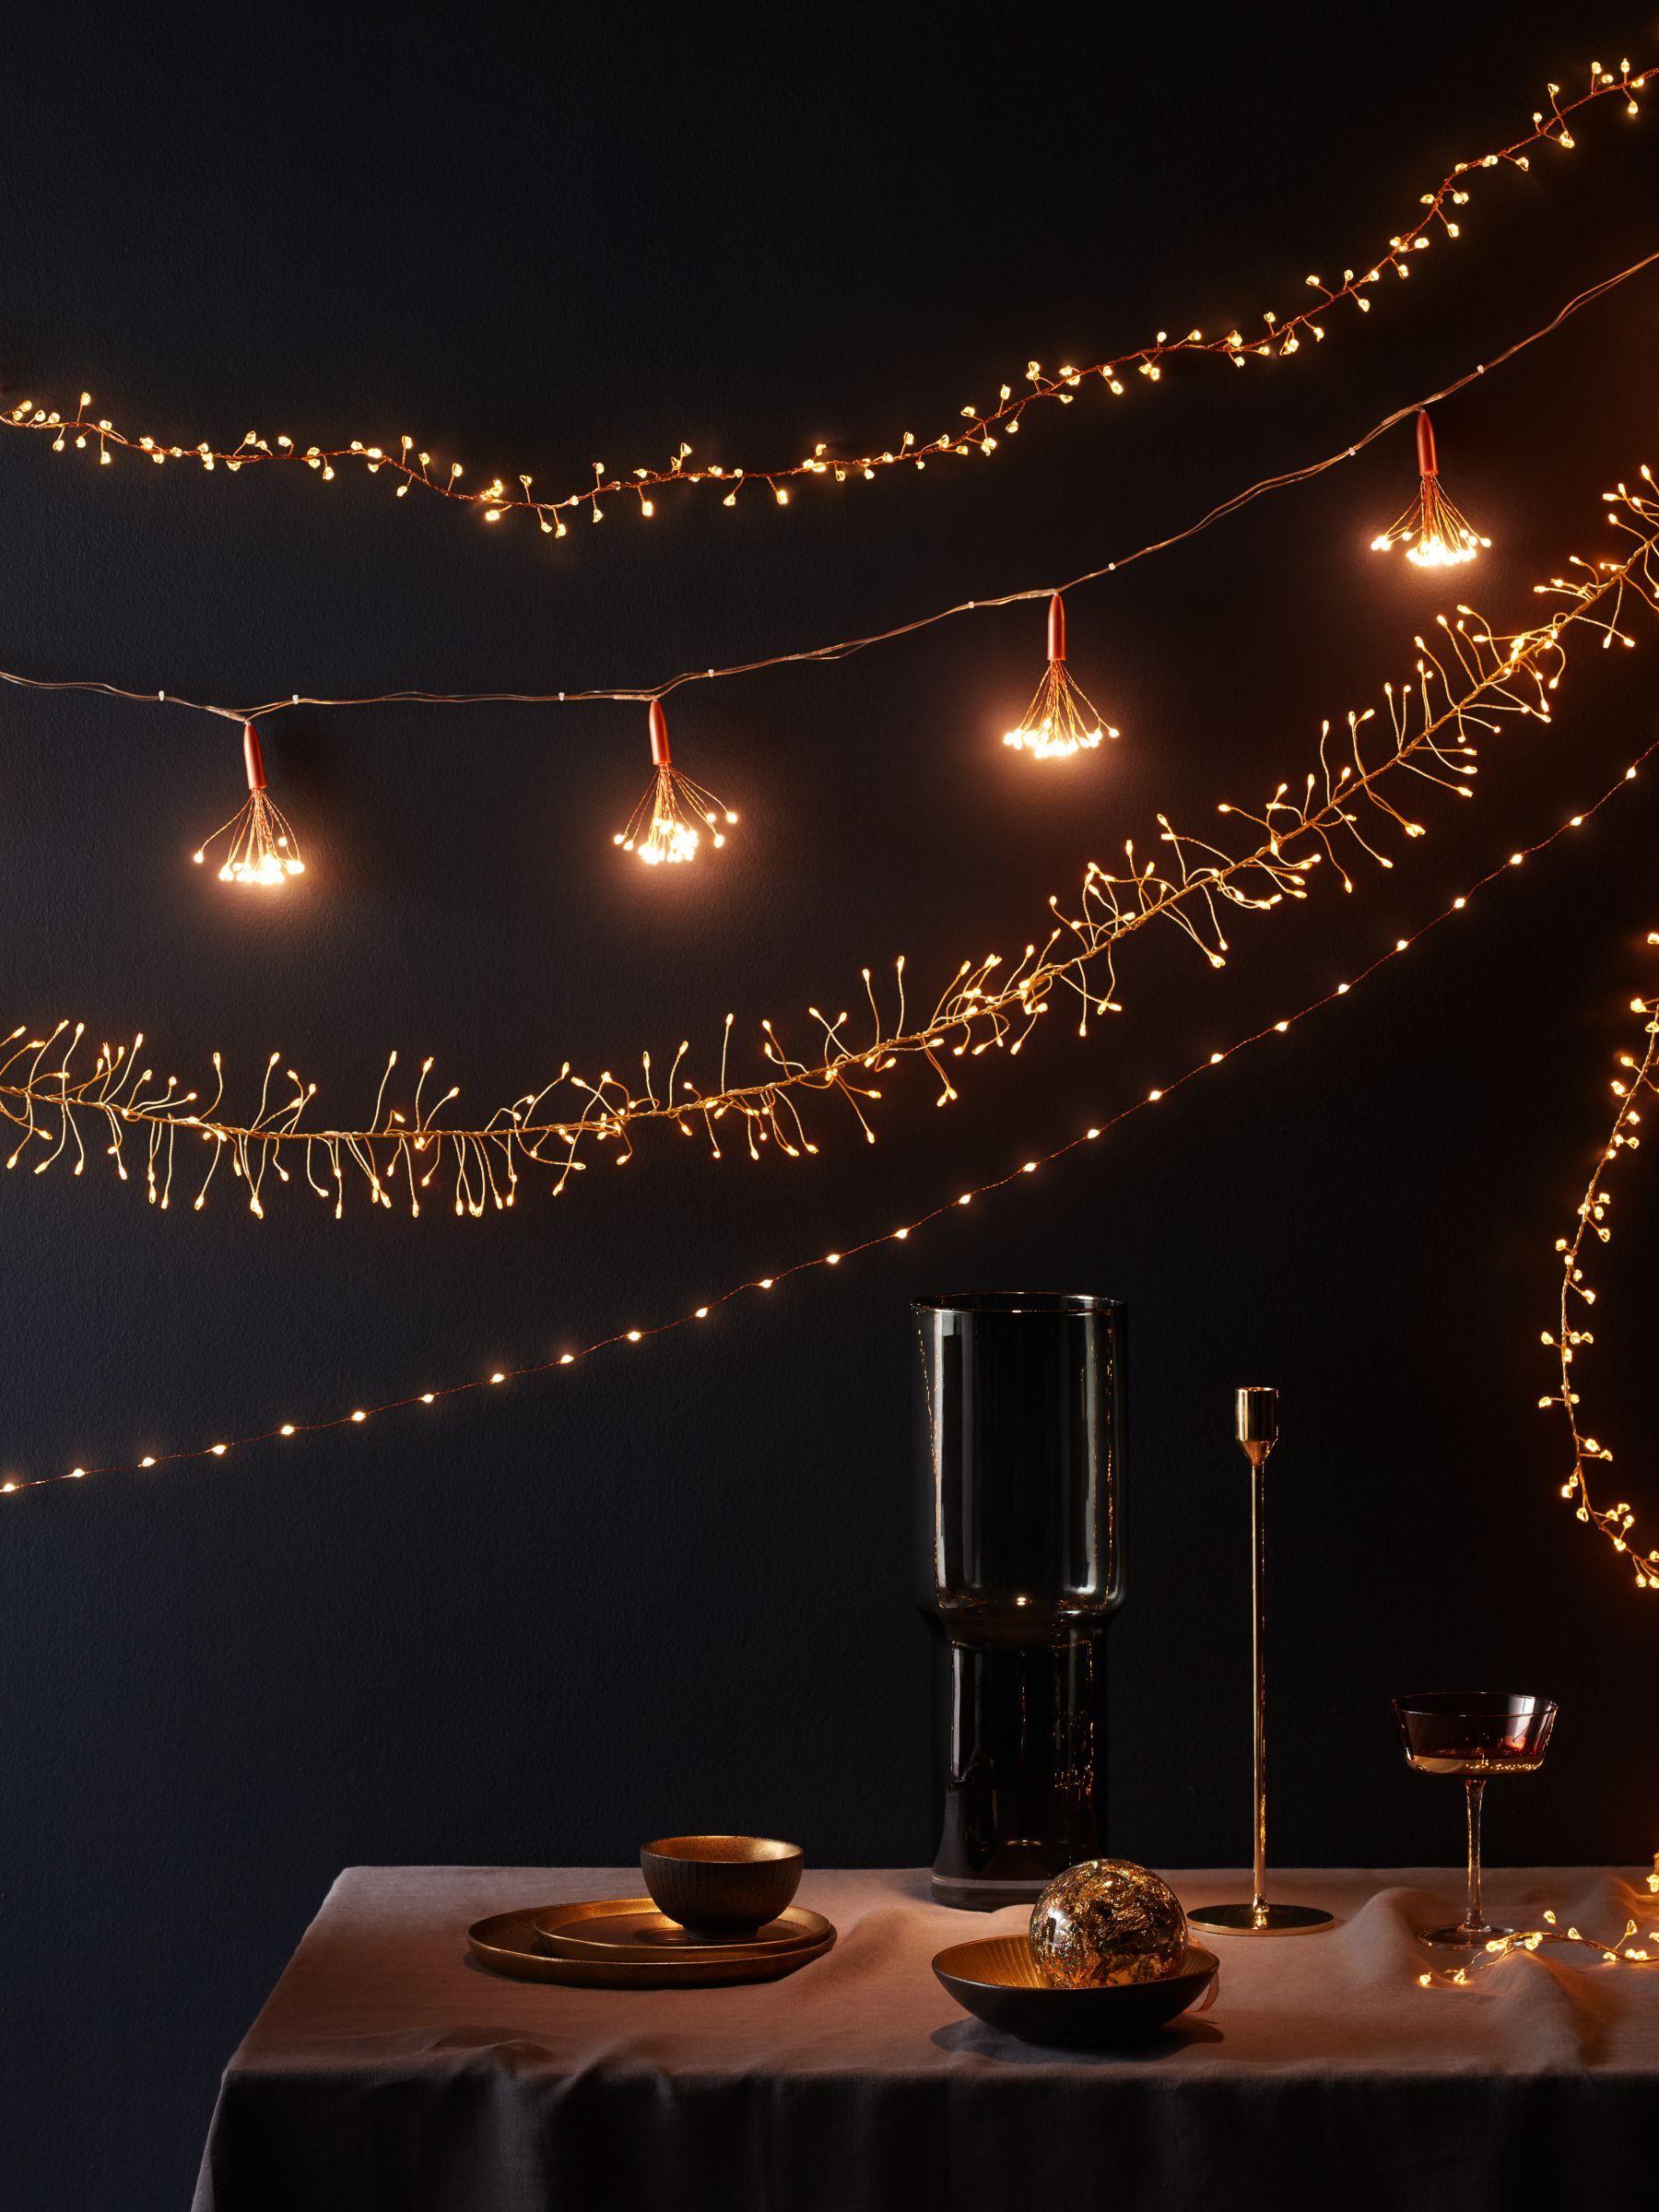 John Lewis & Partners 480 LED Compact Vine Lights, Copper / Pure White, 11m #purewhite